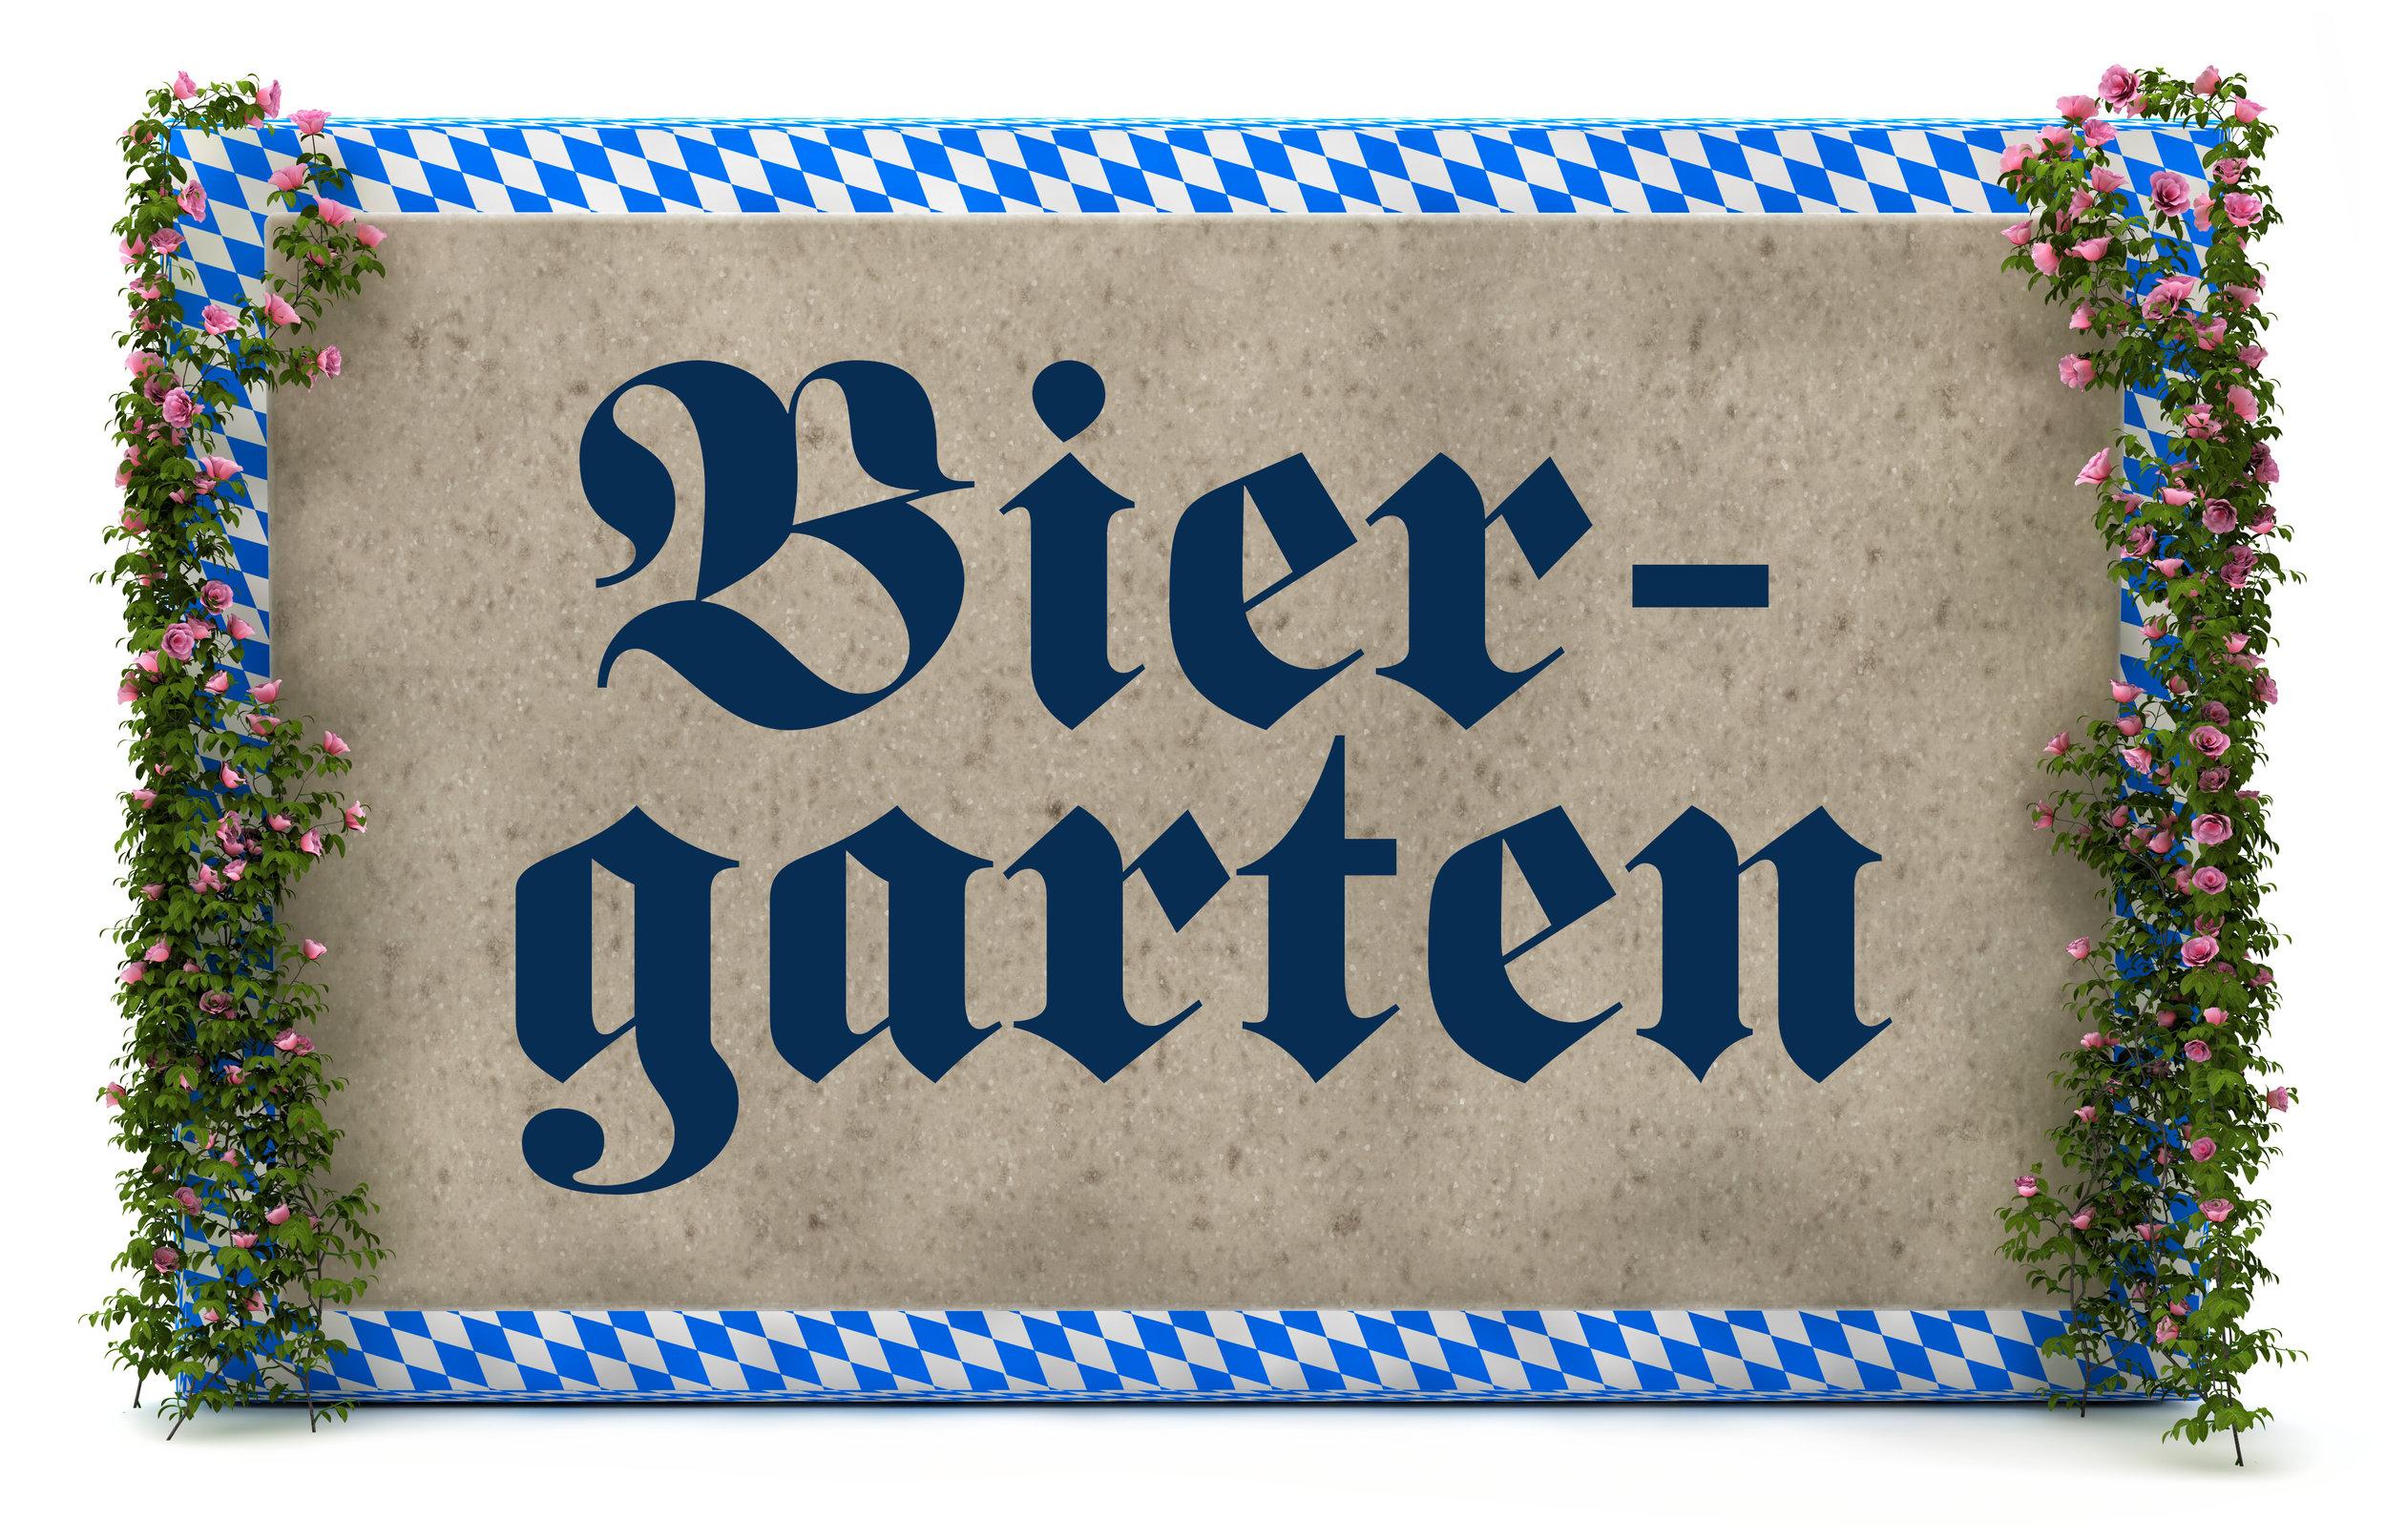 enjoy our biergarten! - w/ imported German biergarten tables